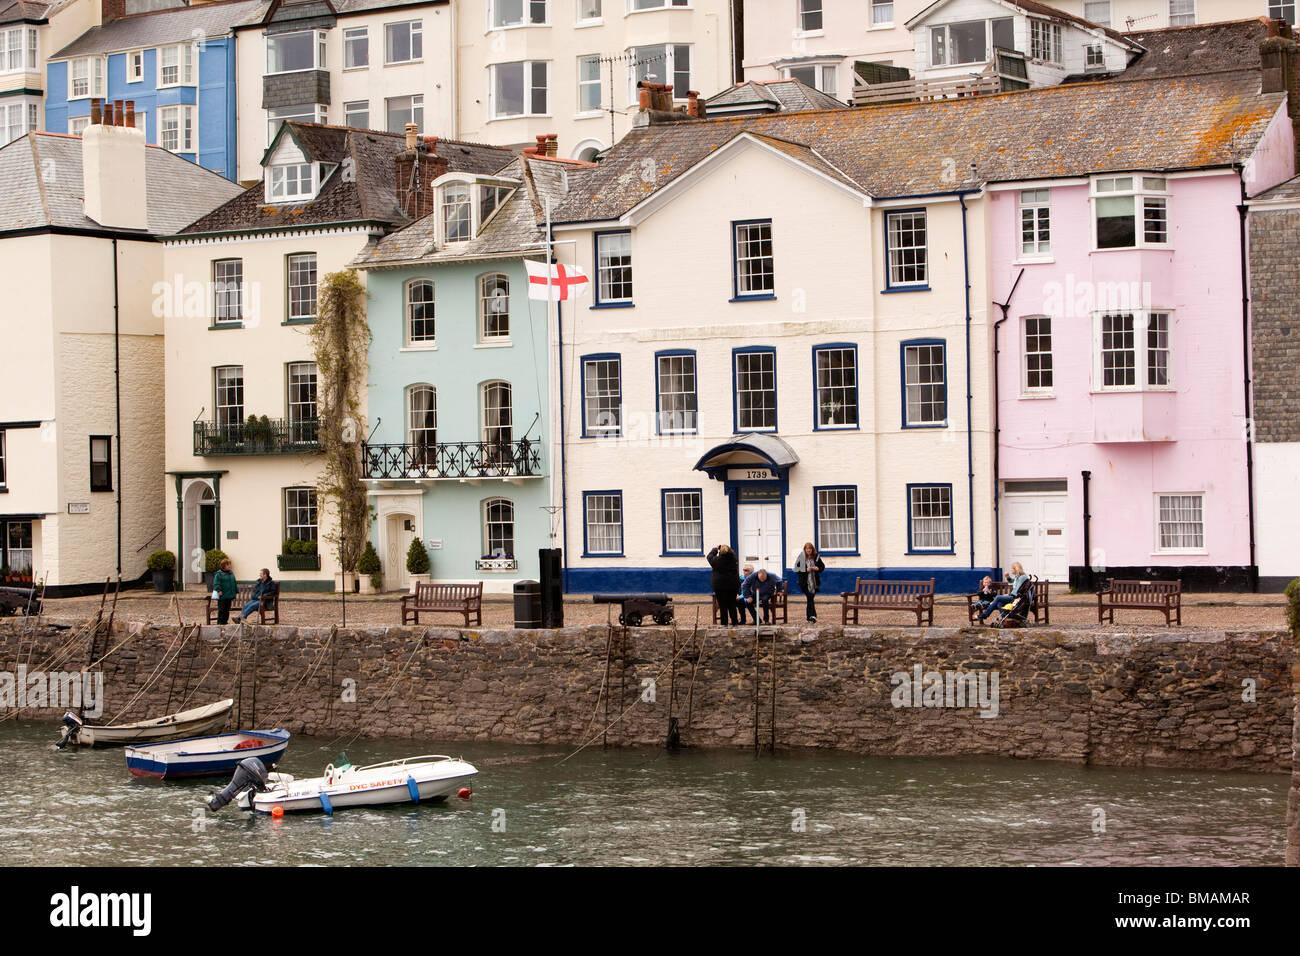 UK, England, Devon, Dartmouth, Bayard's Cove small boats moored at quayside Stock Photo